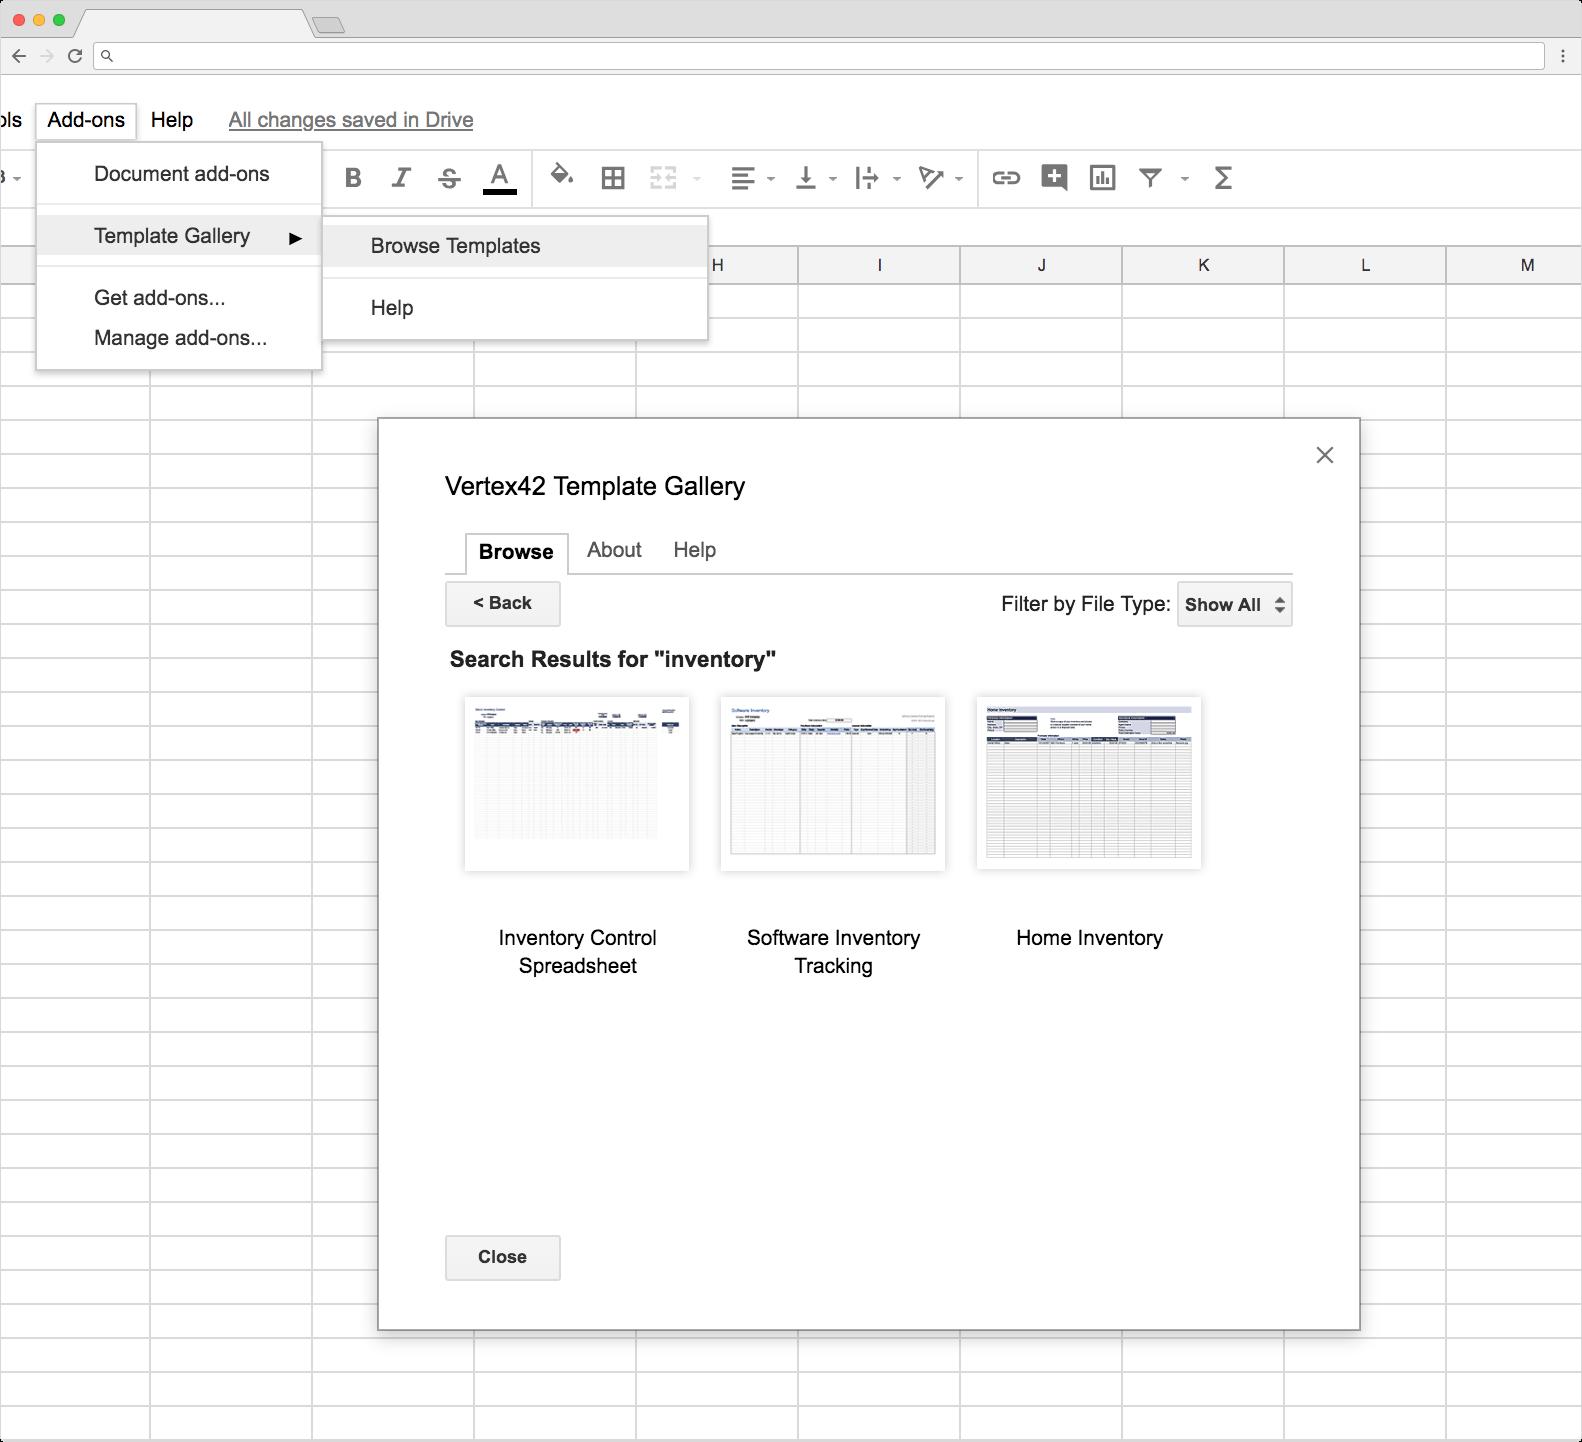 Pallet Tracking Spreadsheet Throughout Top 5 Free Google Sheets Inventory Templates · Blog Sheetgo